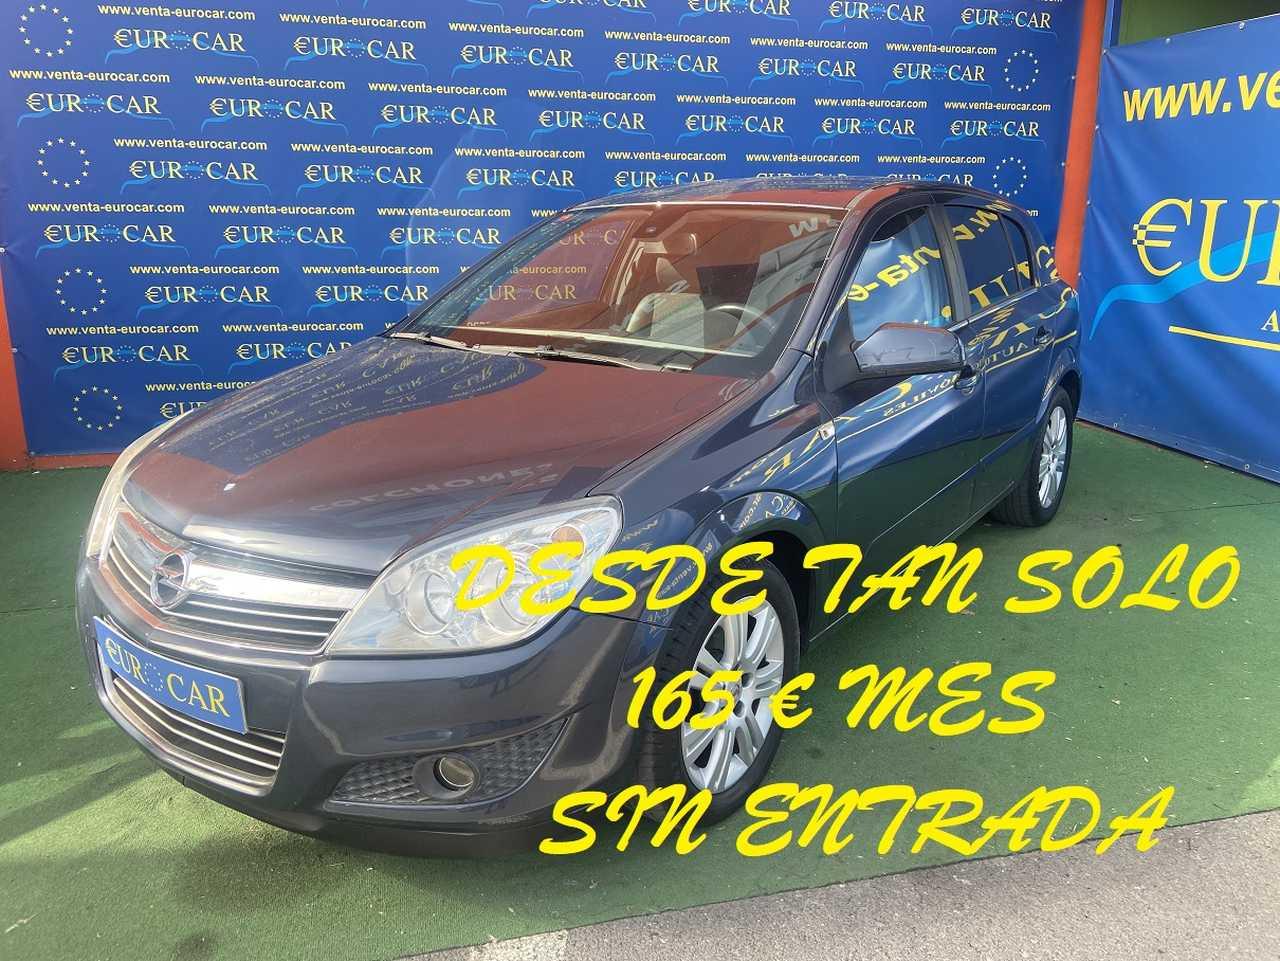 Opel Astra ocasión segunda mano 2010 Diésel por 3.950€ en Alicante